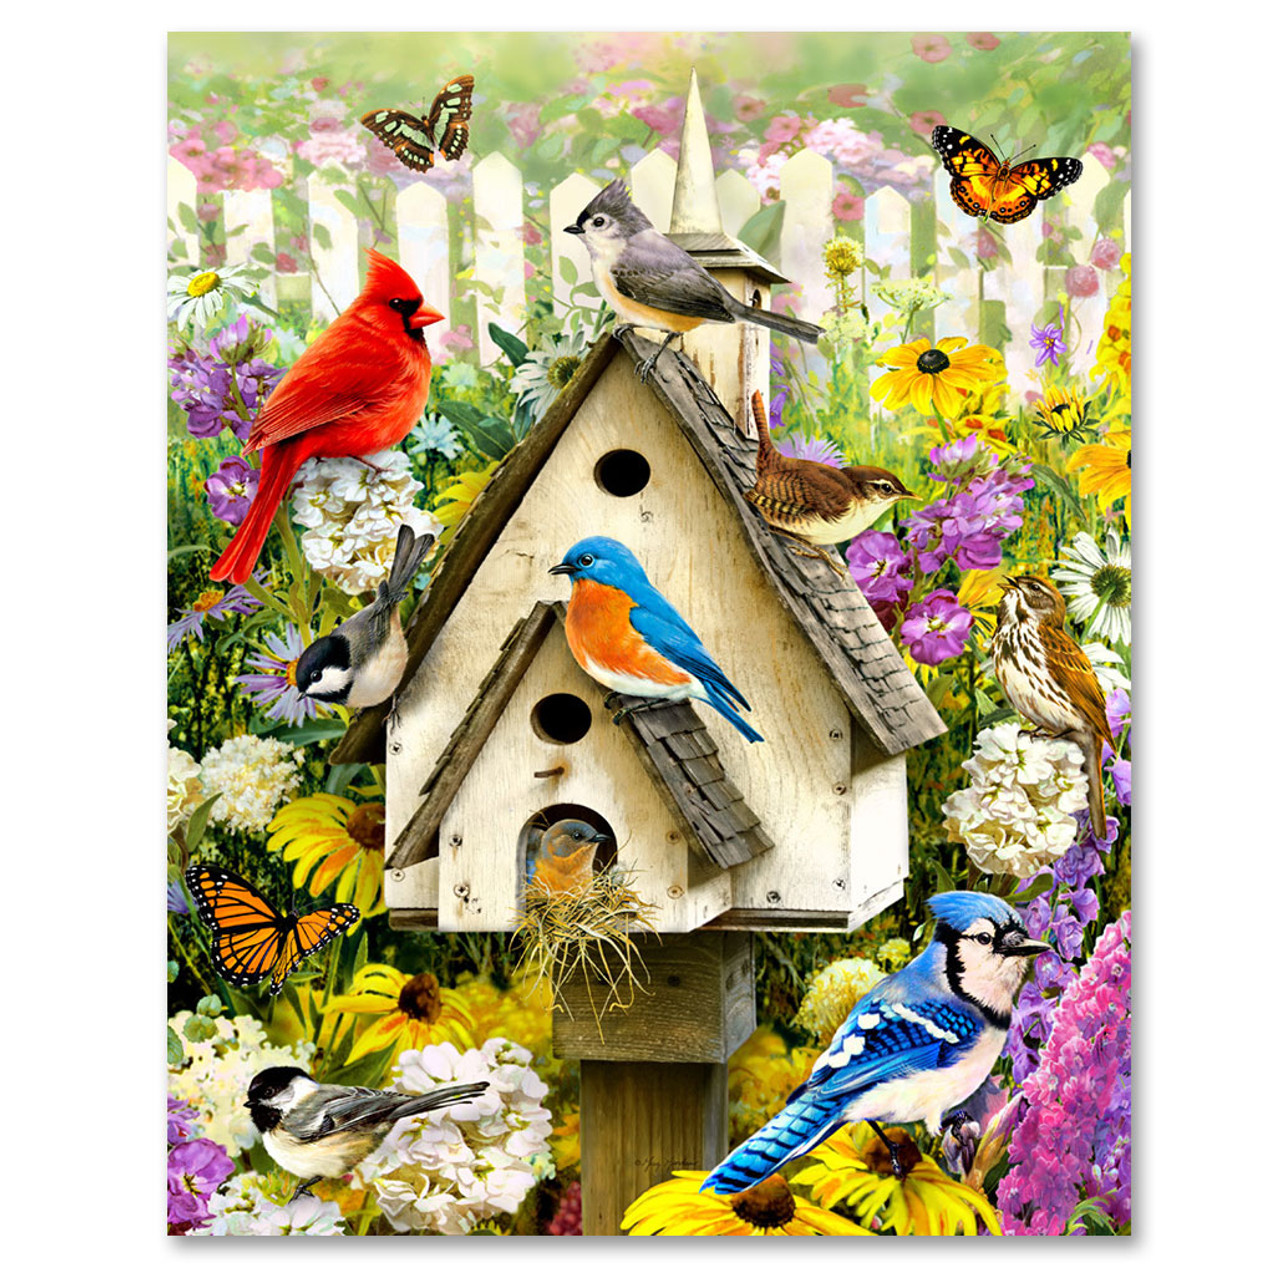 Backyard Birds 1000 Puzzle